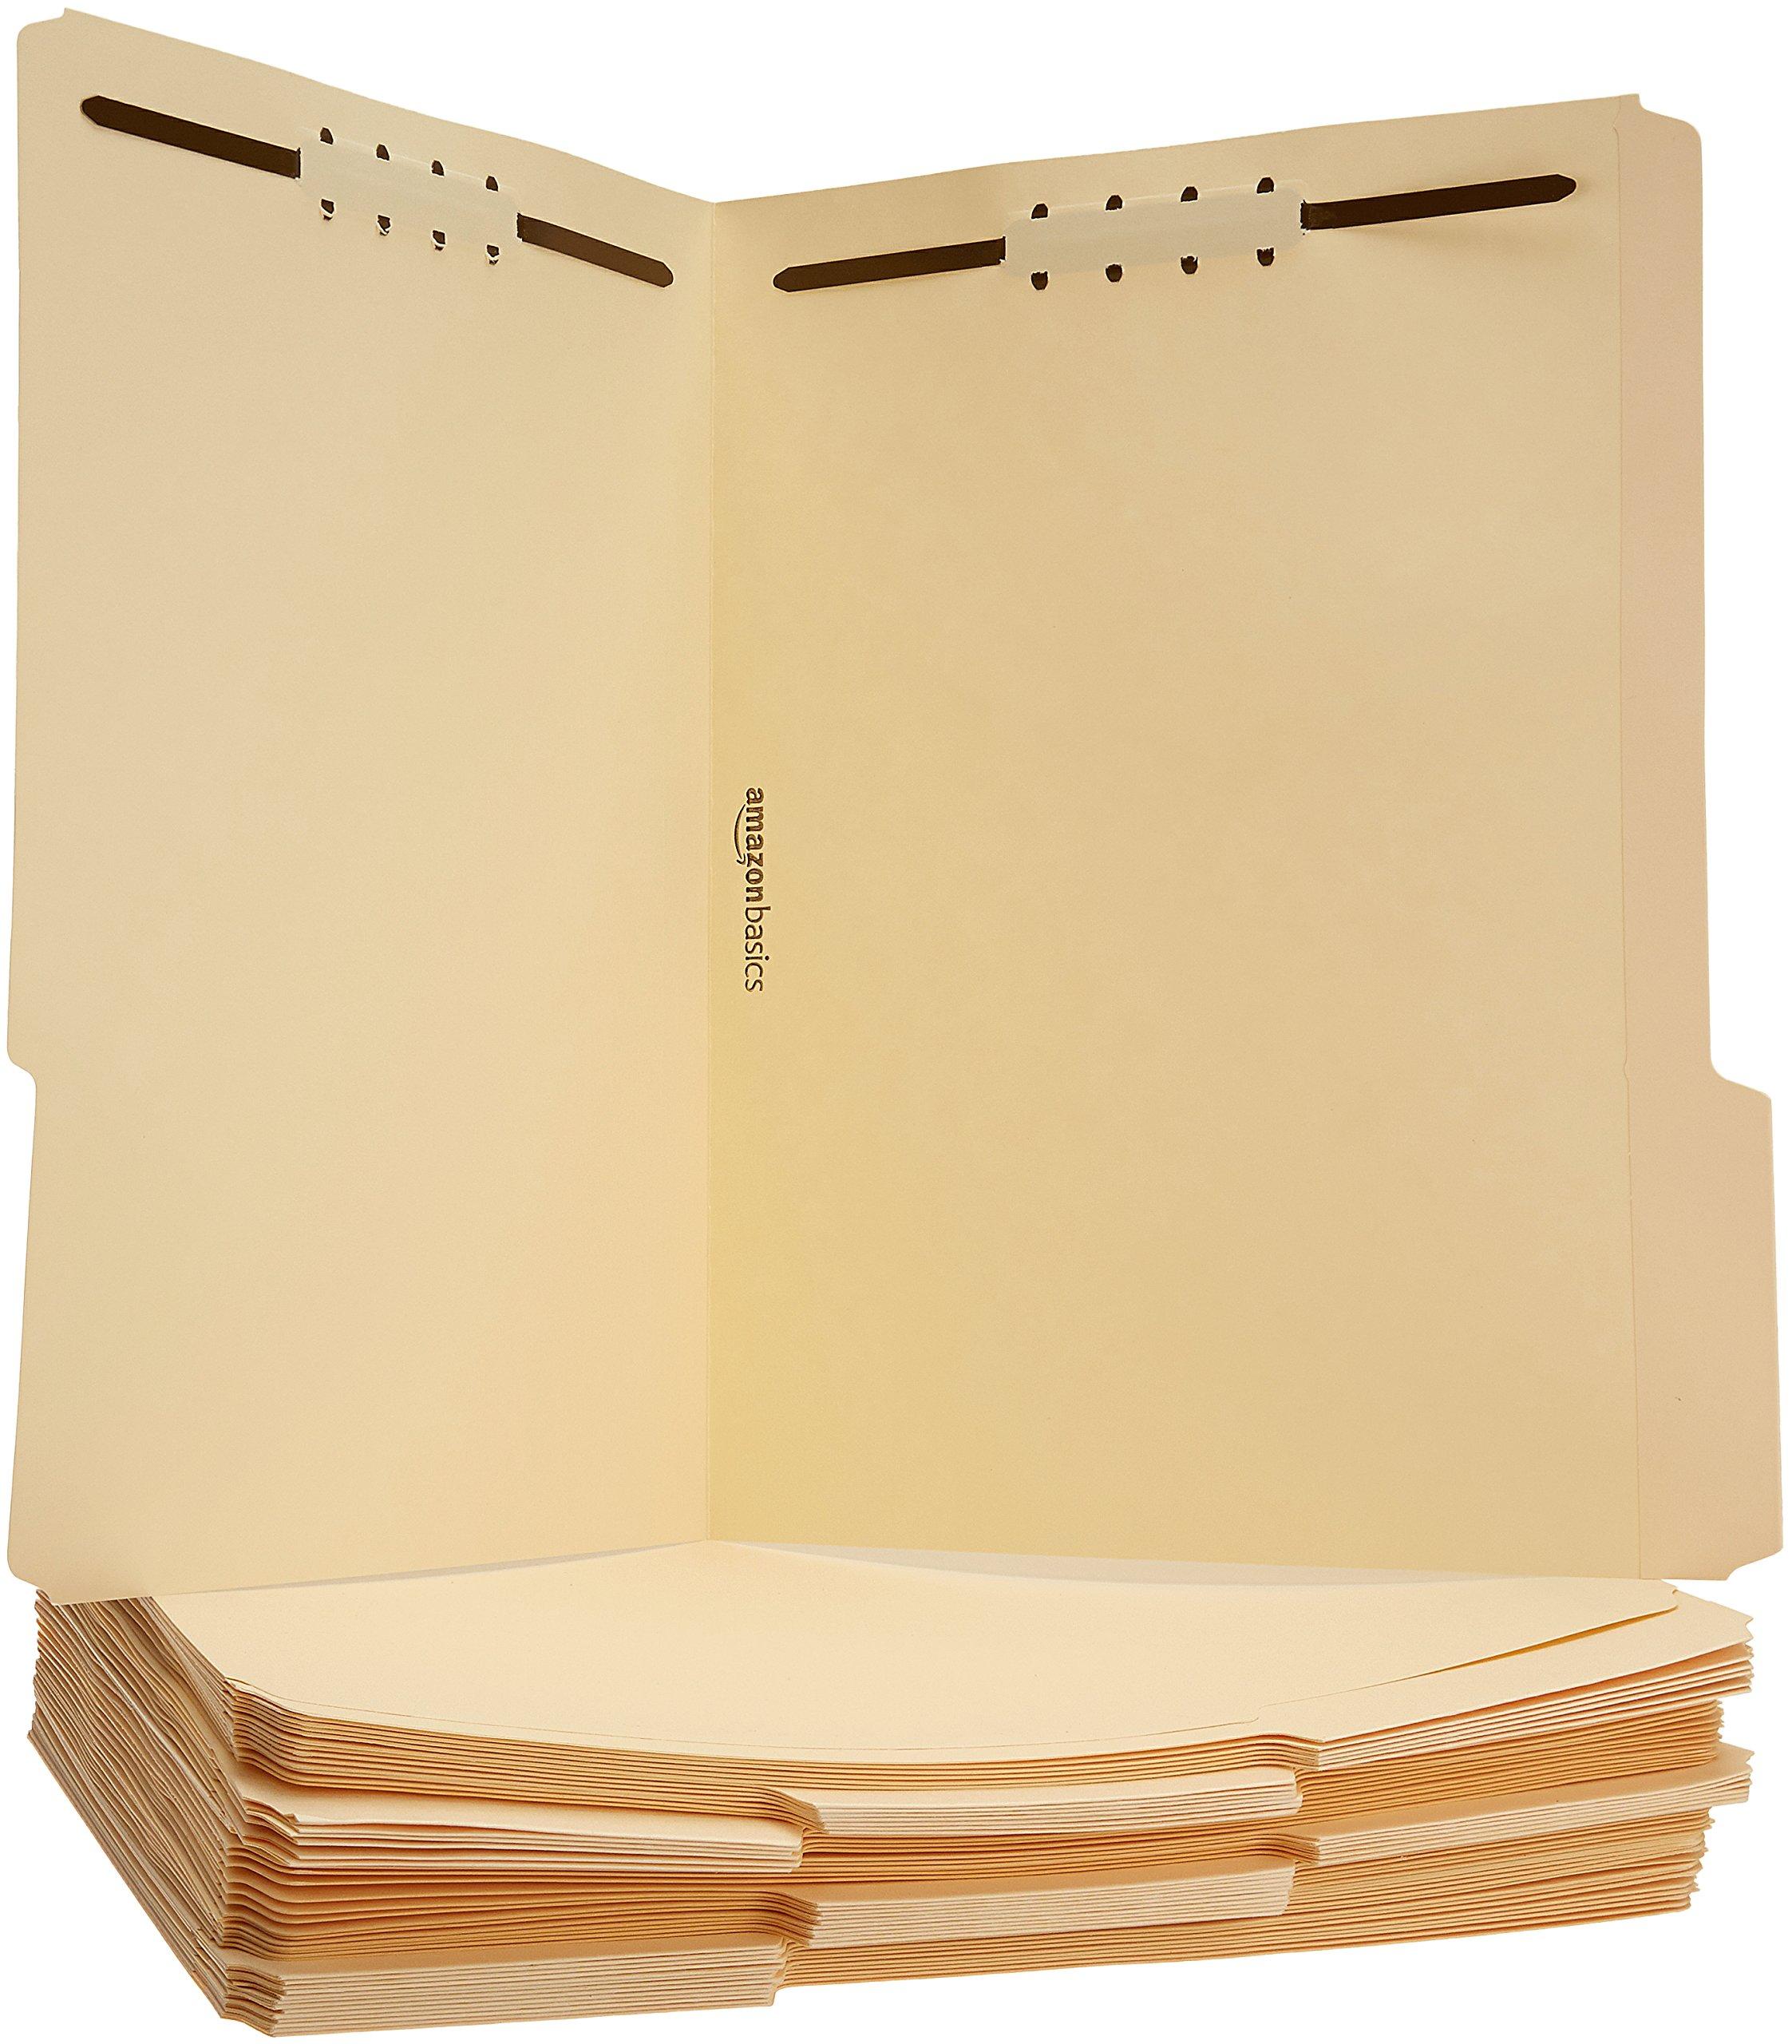 AmazonBasics Manila File Folders with Fasteners - Letter Size, 50-Pack